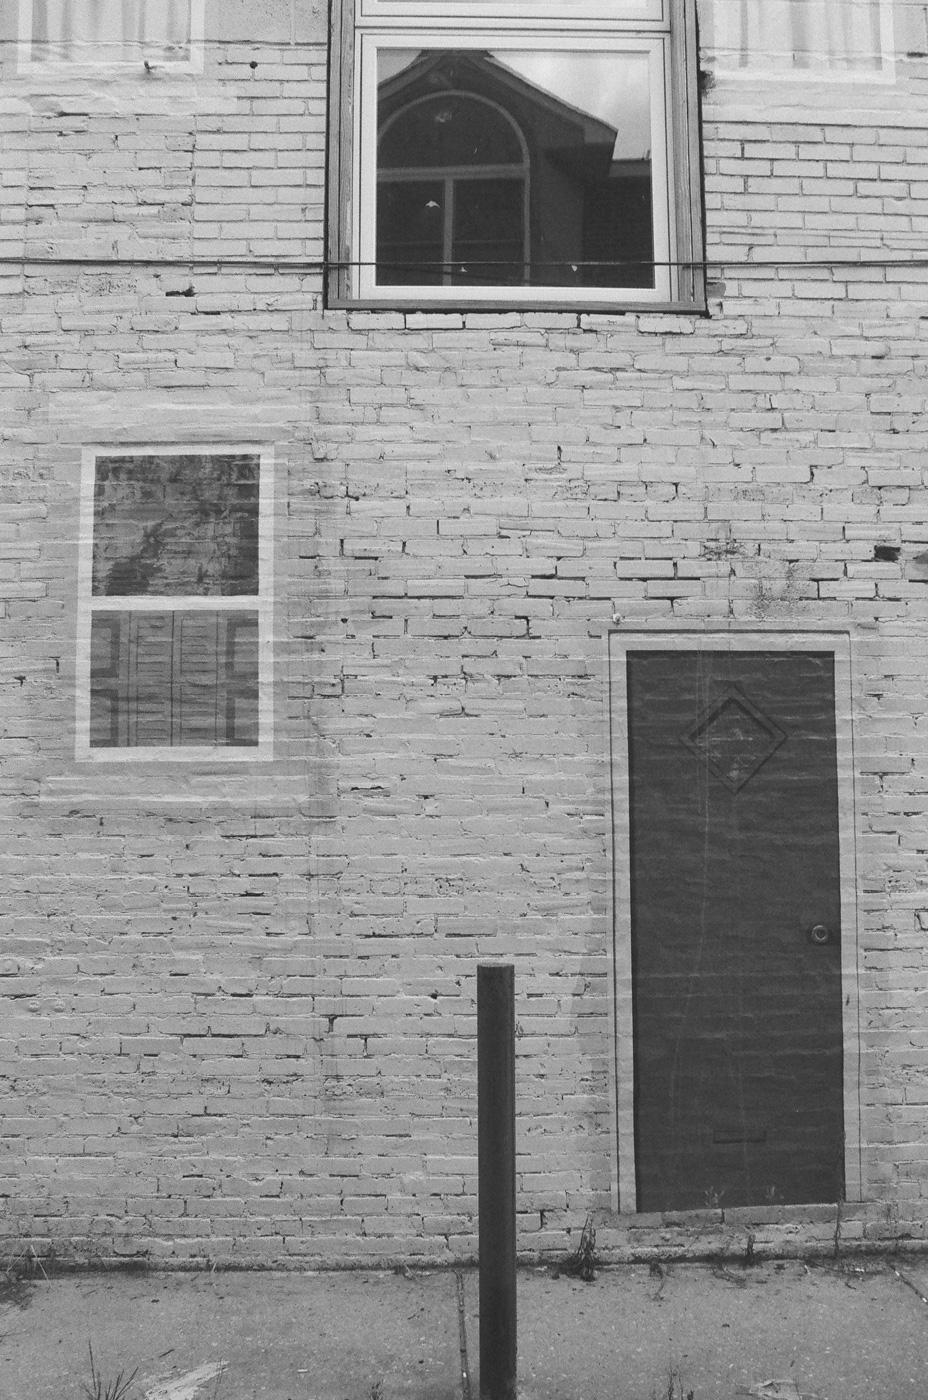 Fake Door and One Fake Window